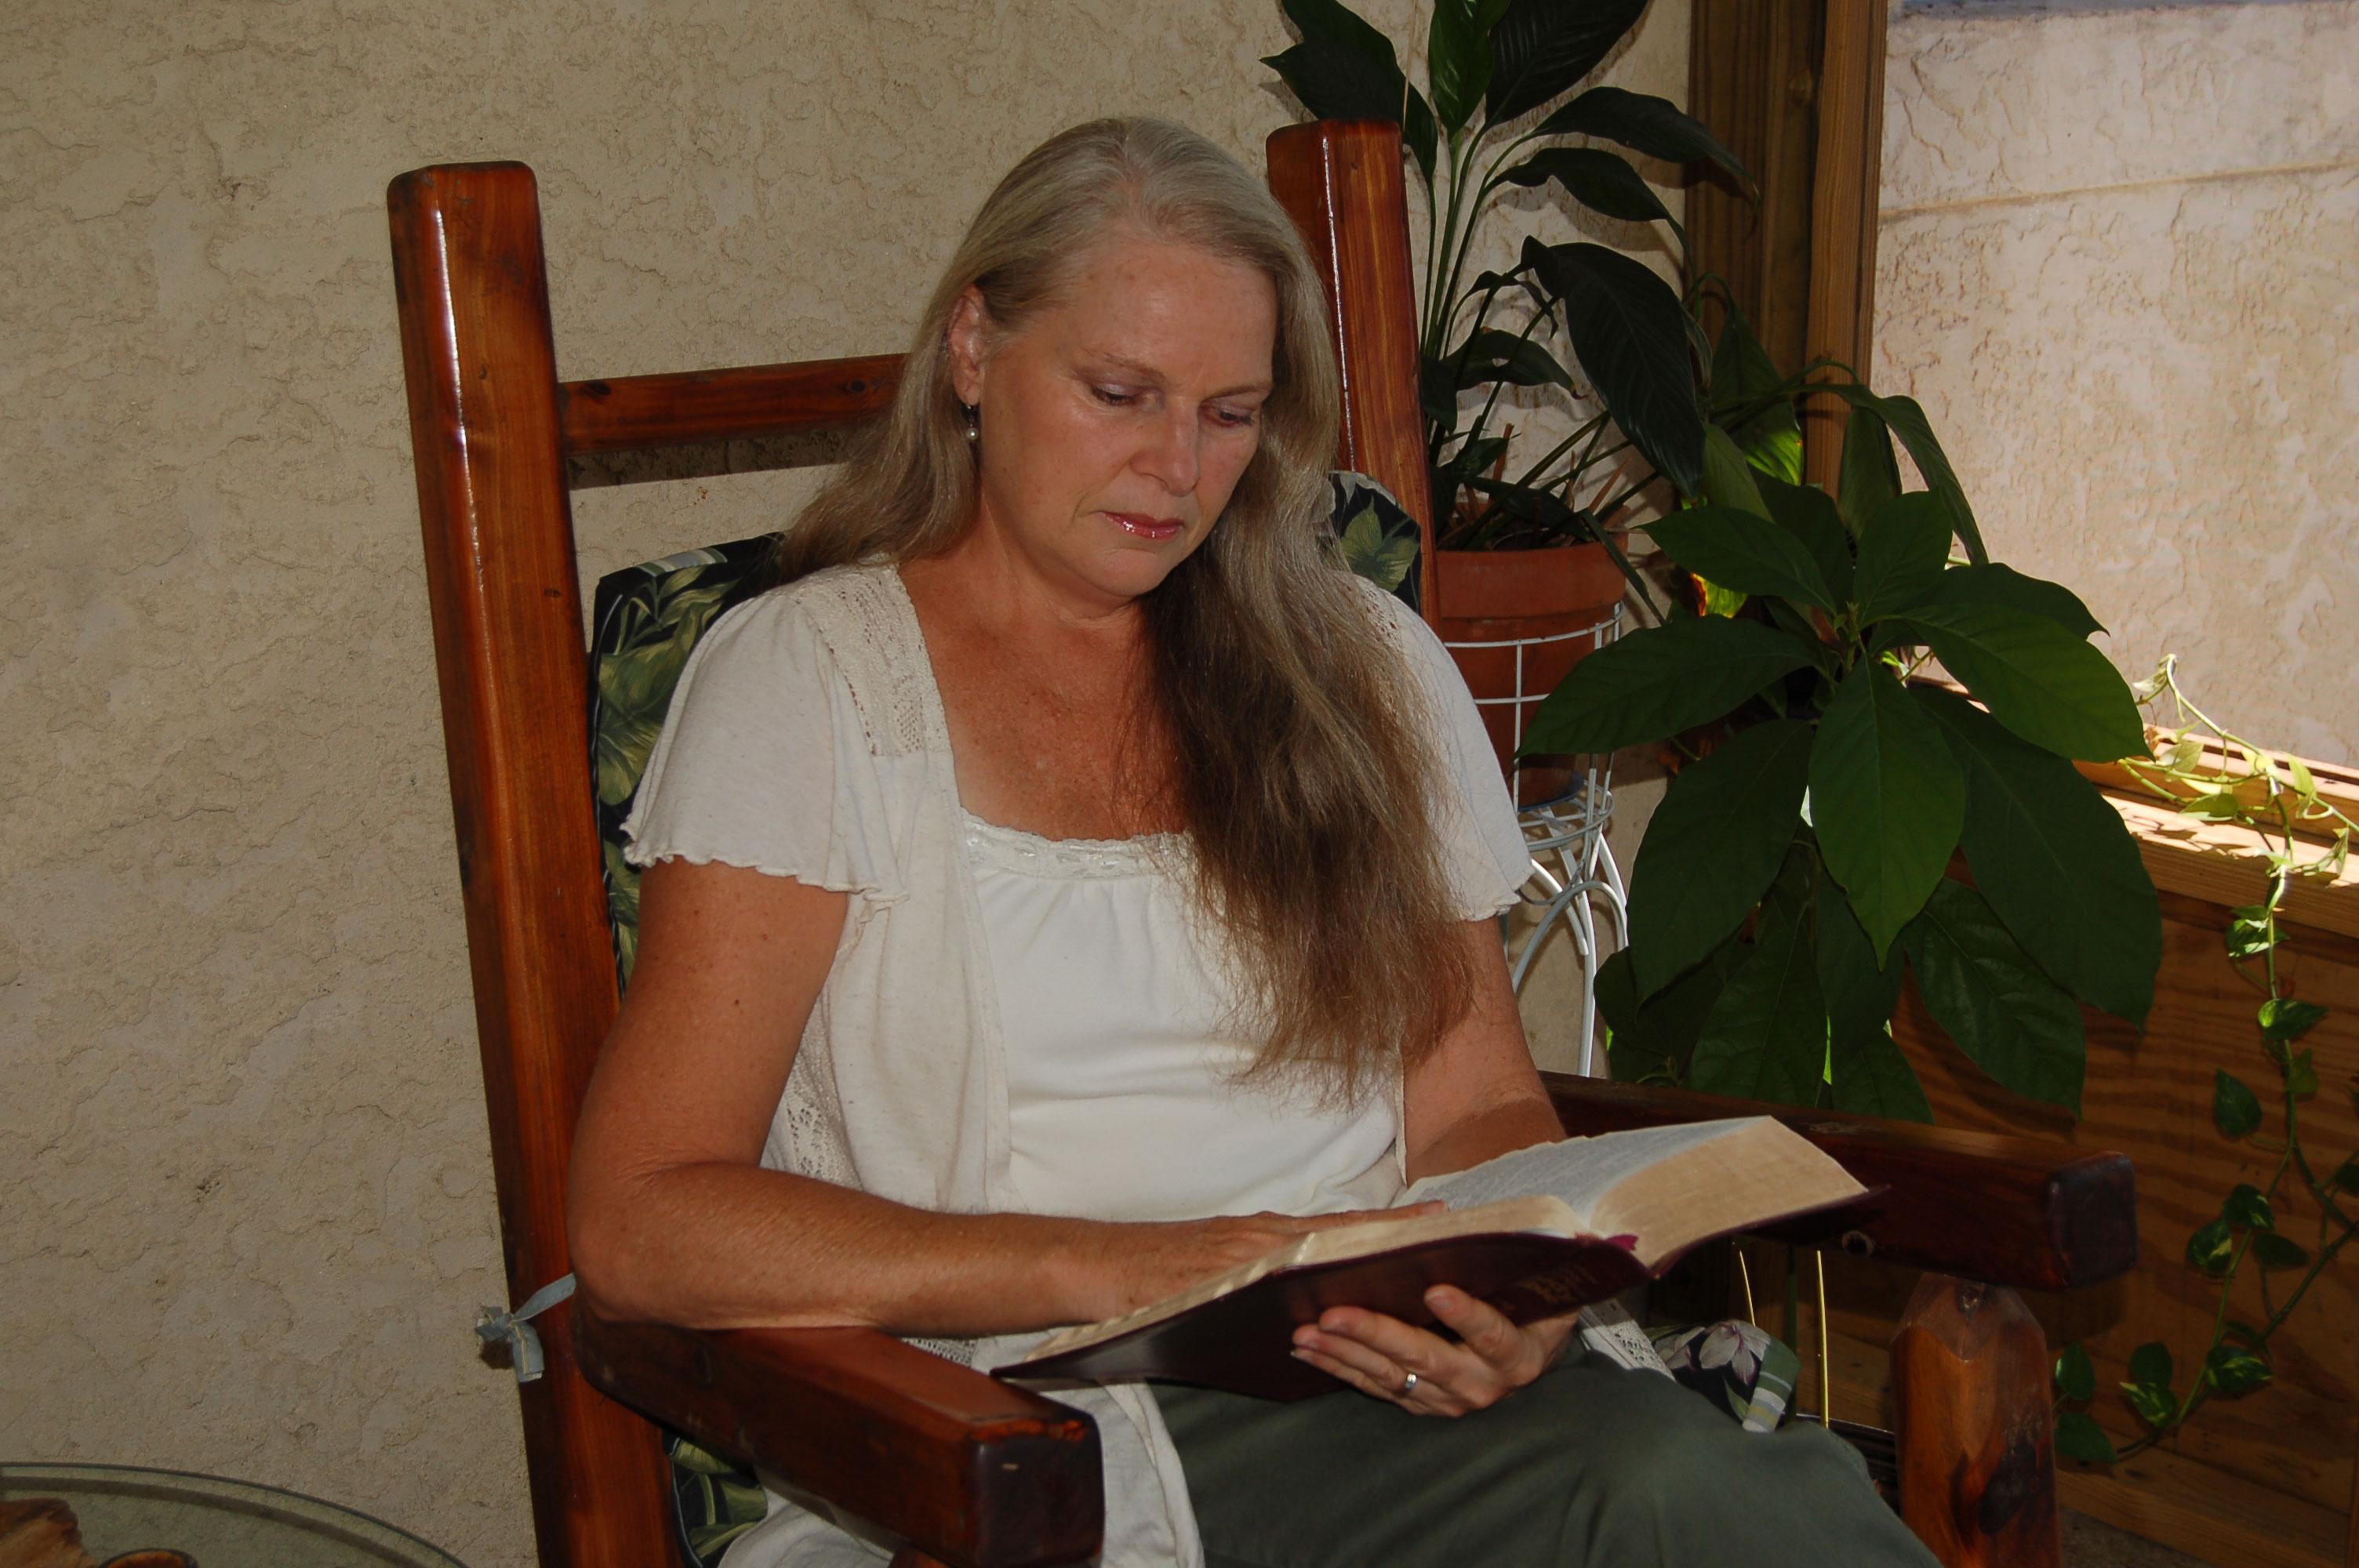 Christian Stock Photos by Linda Bateman - Woman Sitting in Rocking Chair Reading Bible